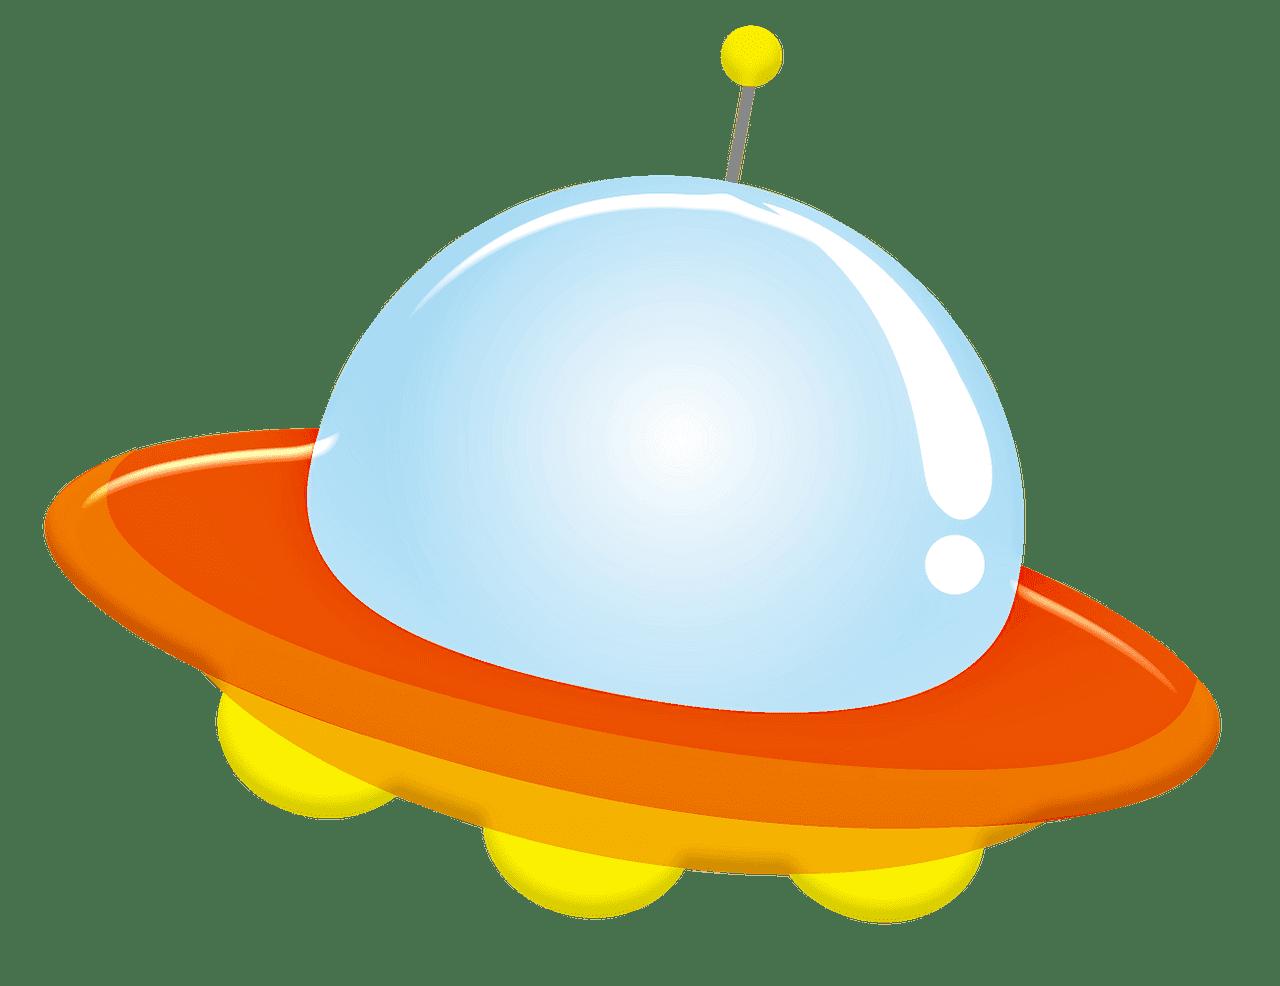 UFO clipart transparent background 4